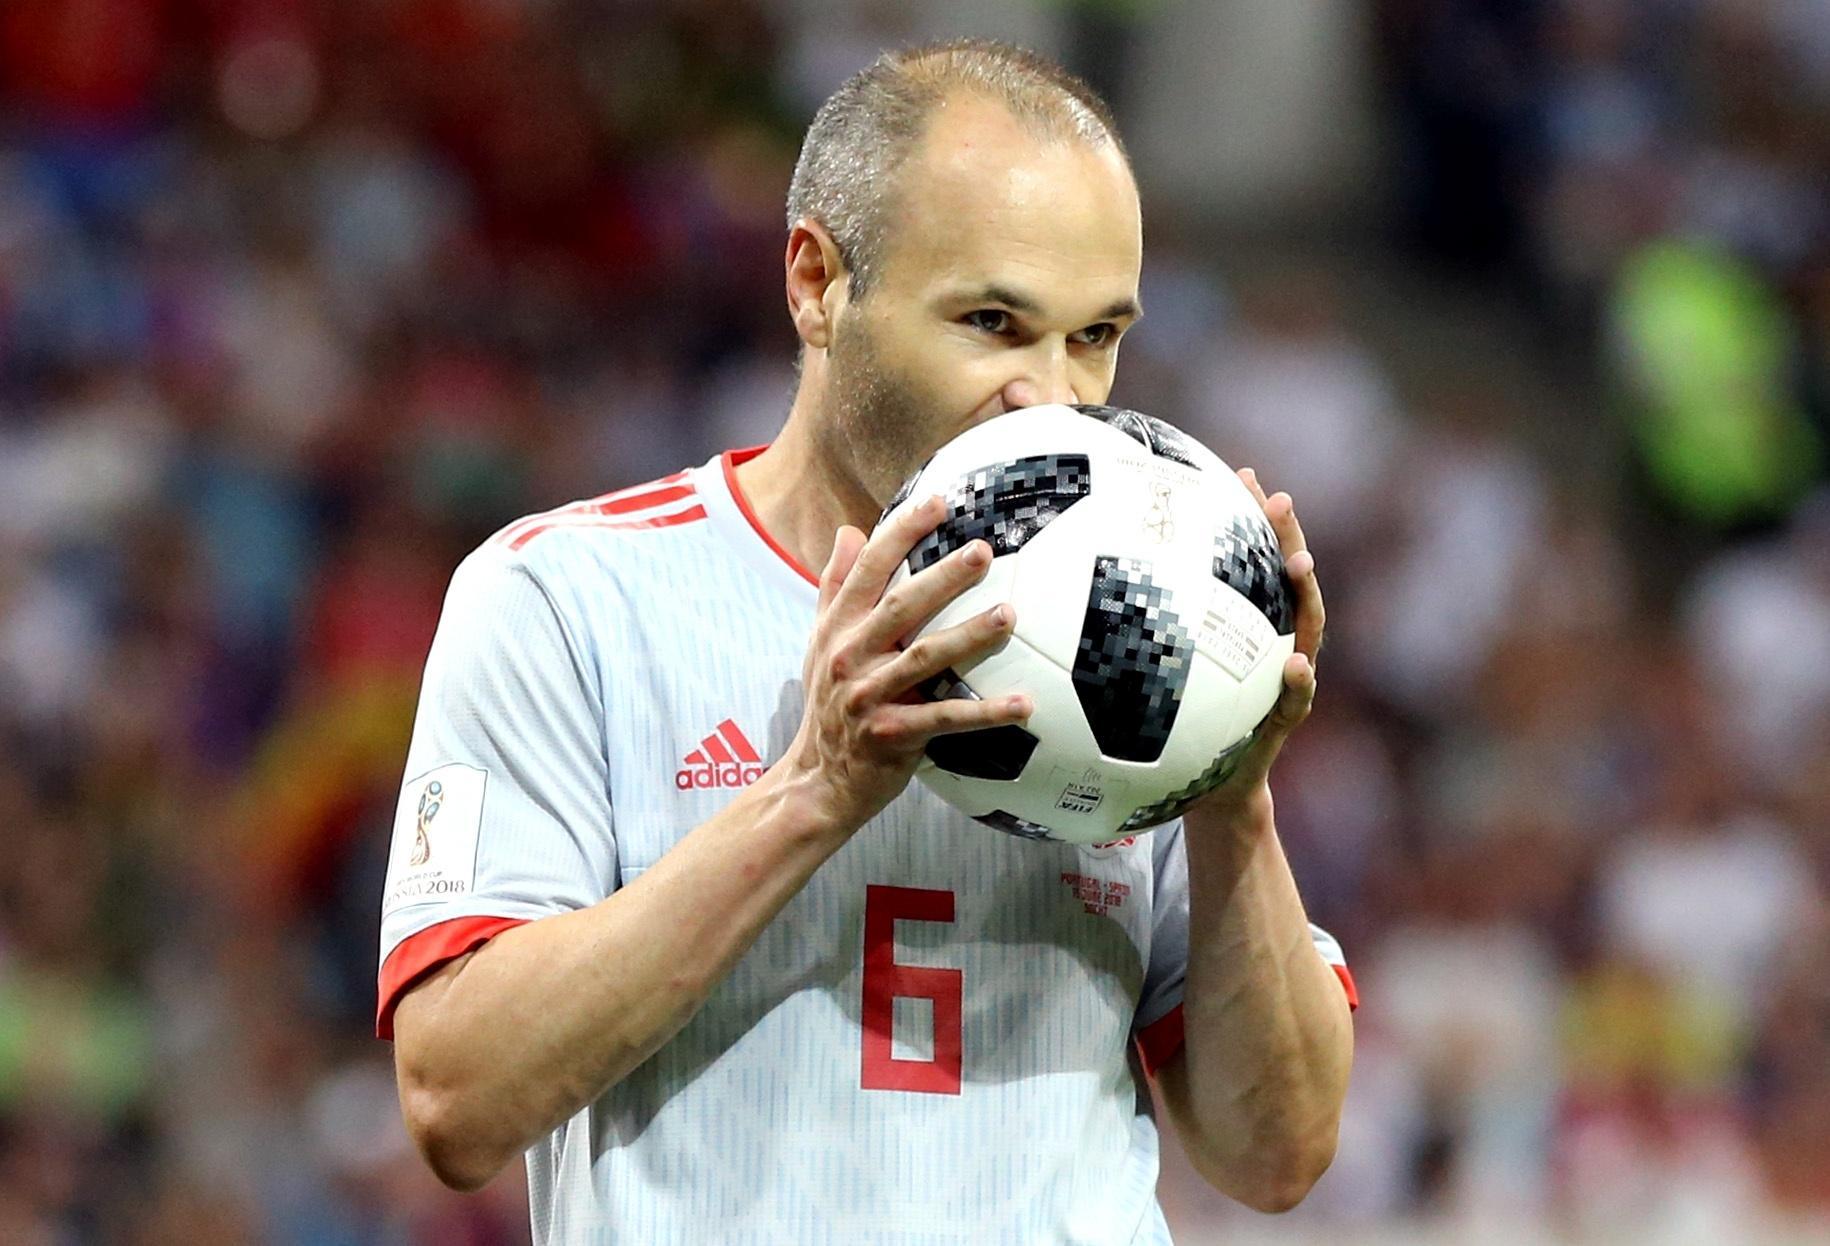 cd4b2471eb Espanha na Copa 2018  Em carta